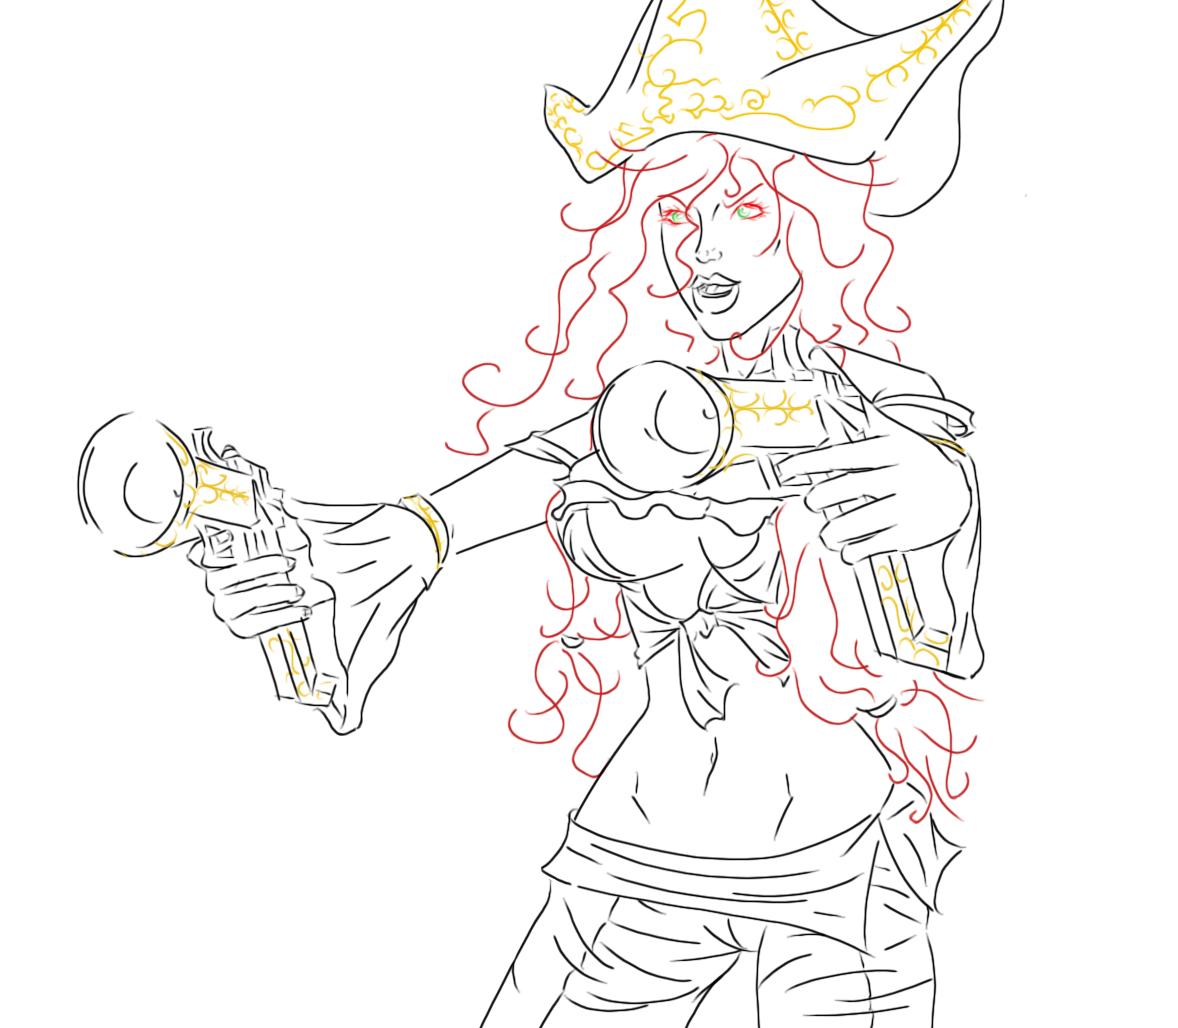 Miss Fortune sketch by EndOfDream on DeviantArt